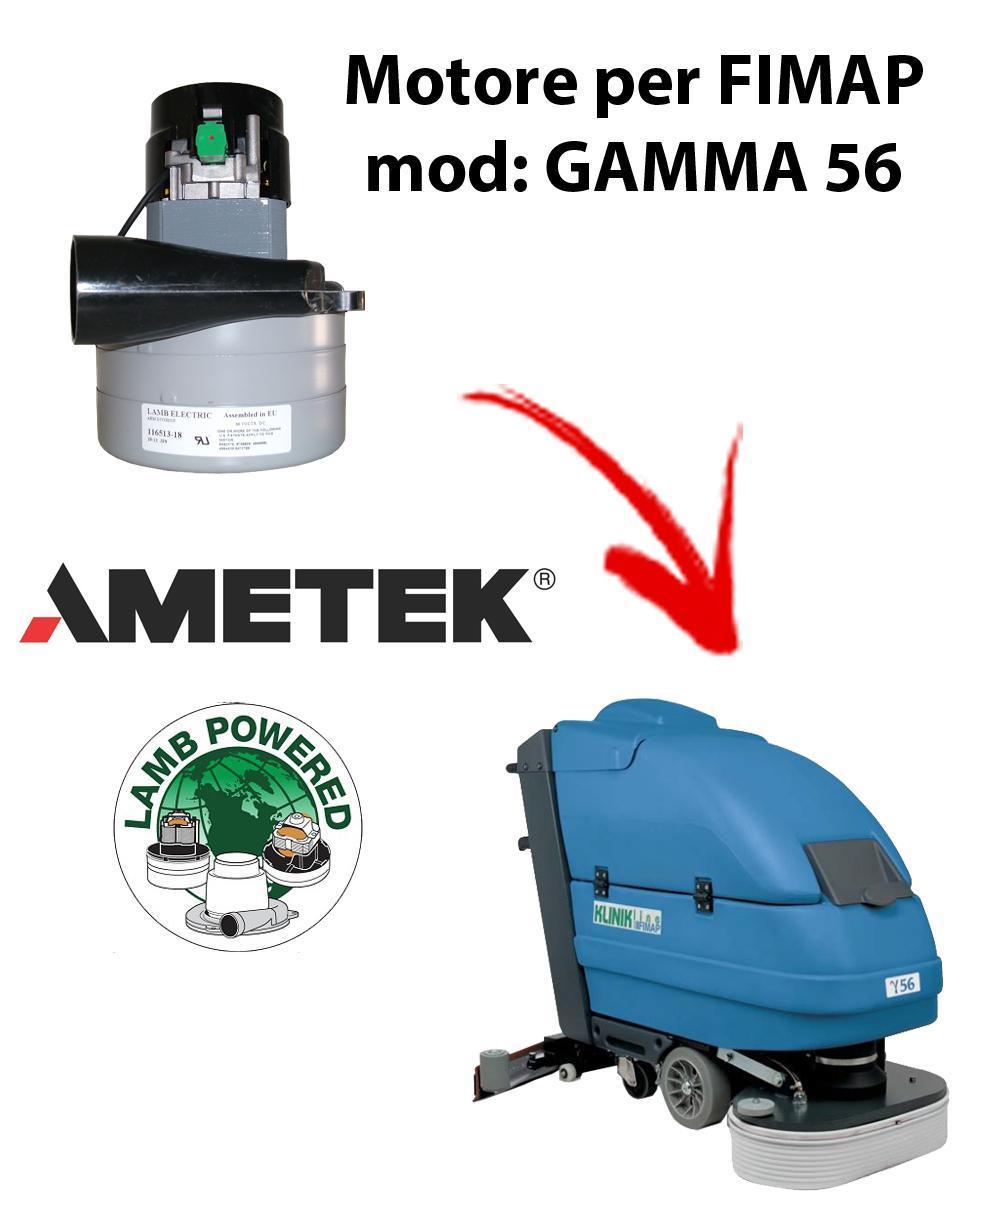 GAMMA 56 Saugmotor AMETEK für scheuersaugmaschinen FIMAP